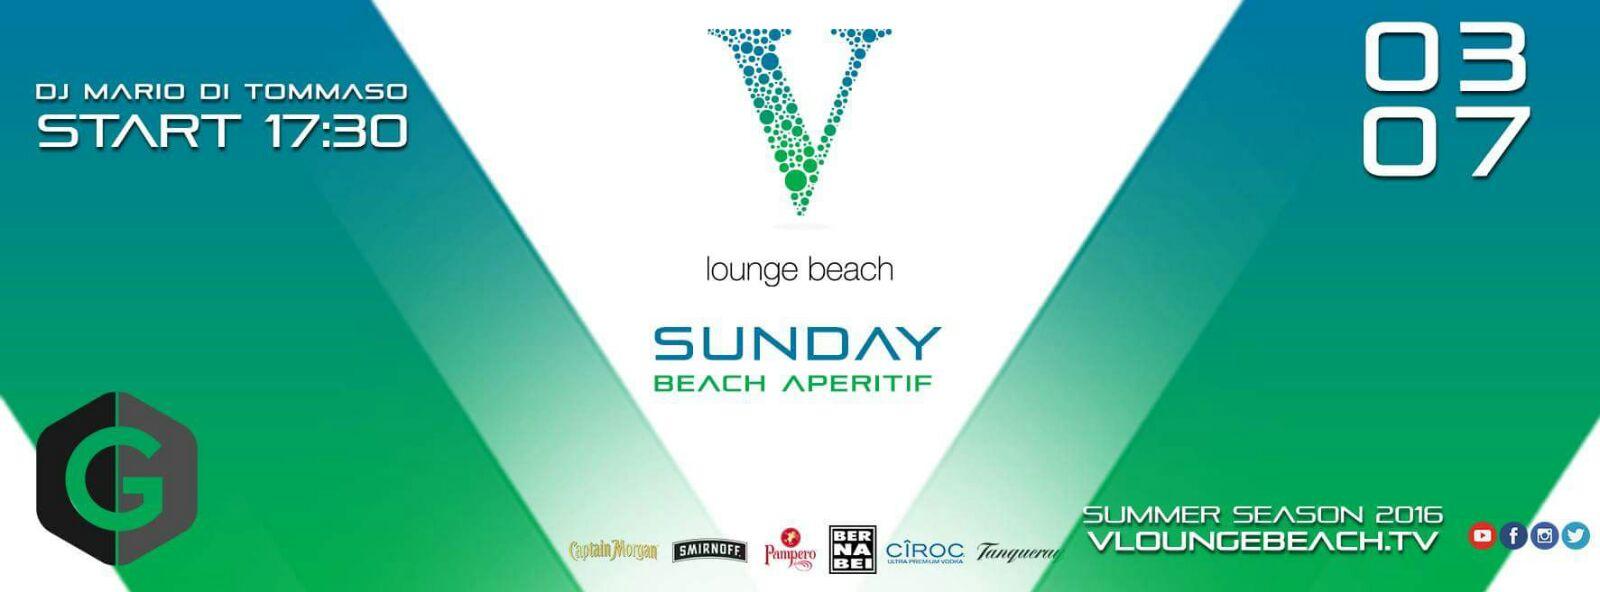 Aperitivo Ostia V Lounge beach